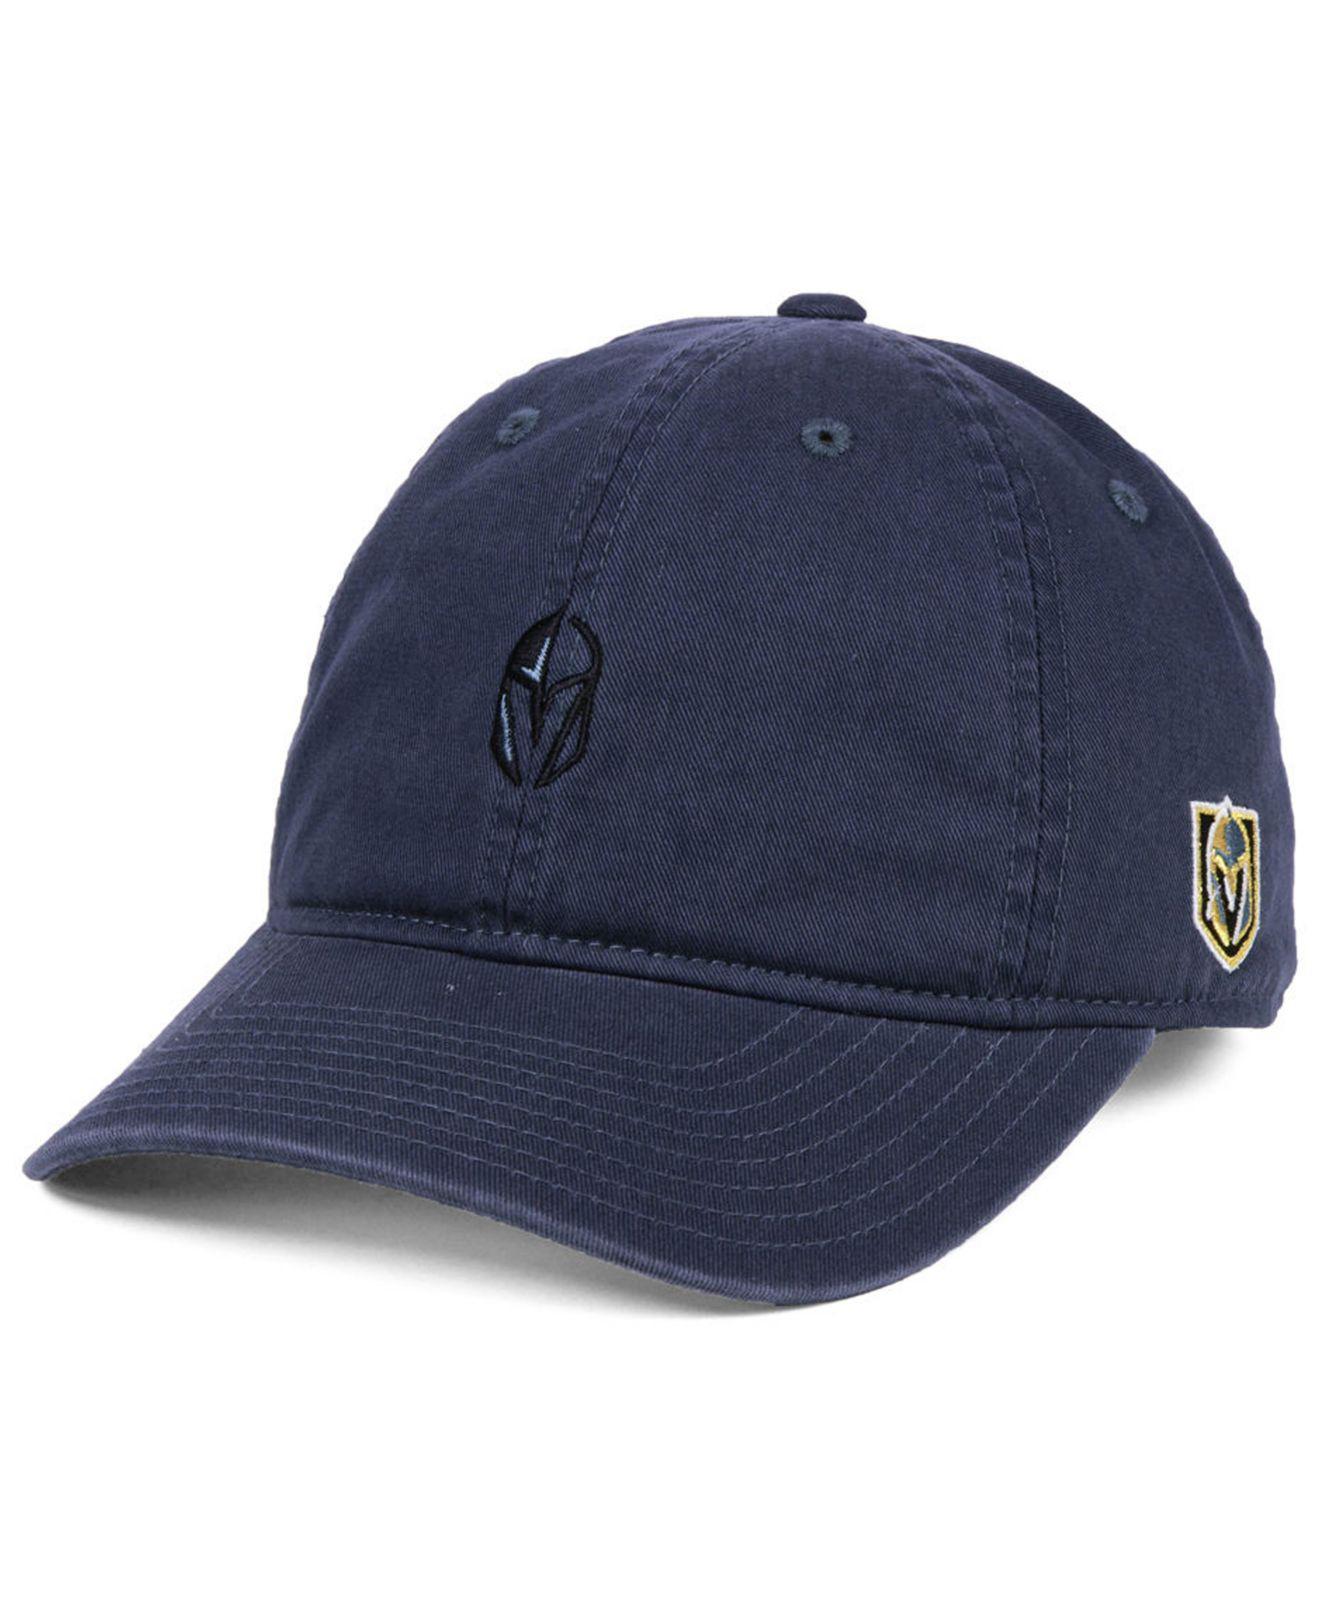 e3d754dc ... norway lyst adidas vegas golden knights element logo adjustable cap in  c194a f1834